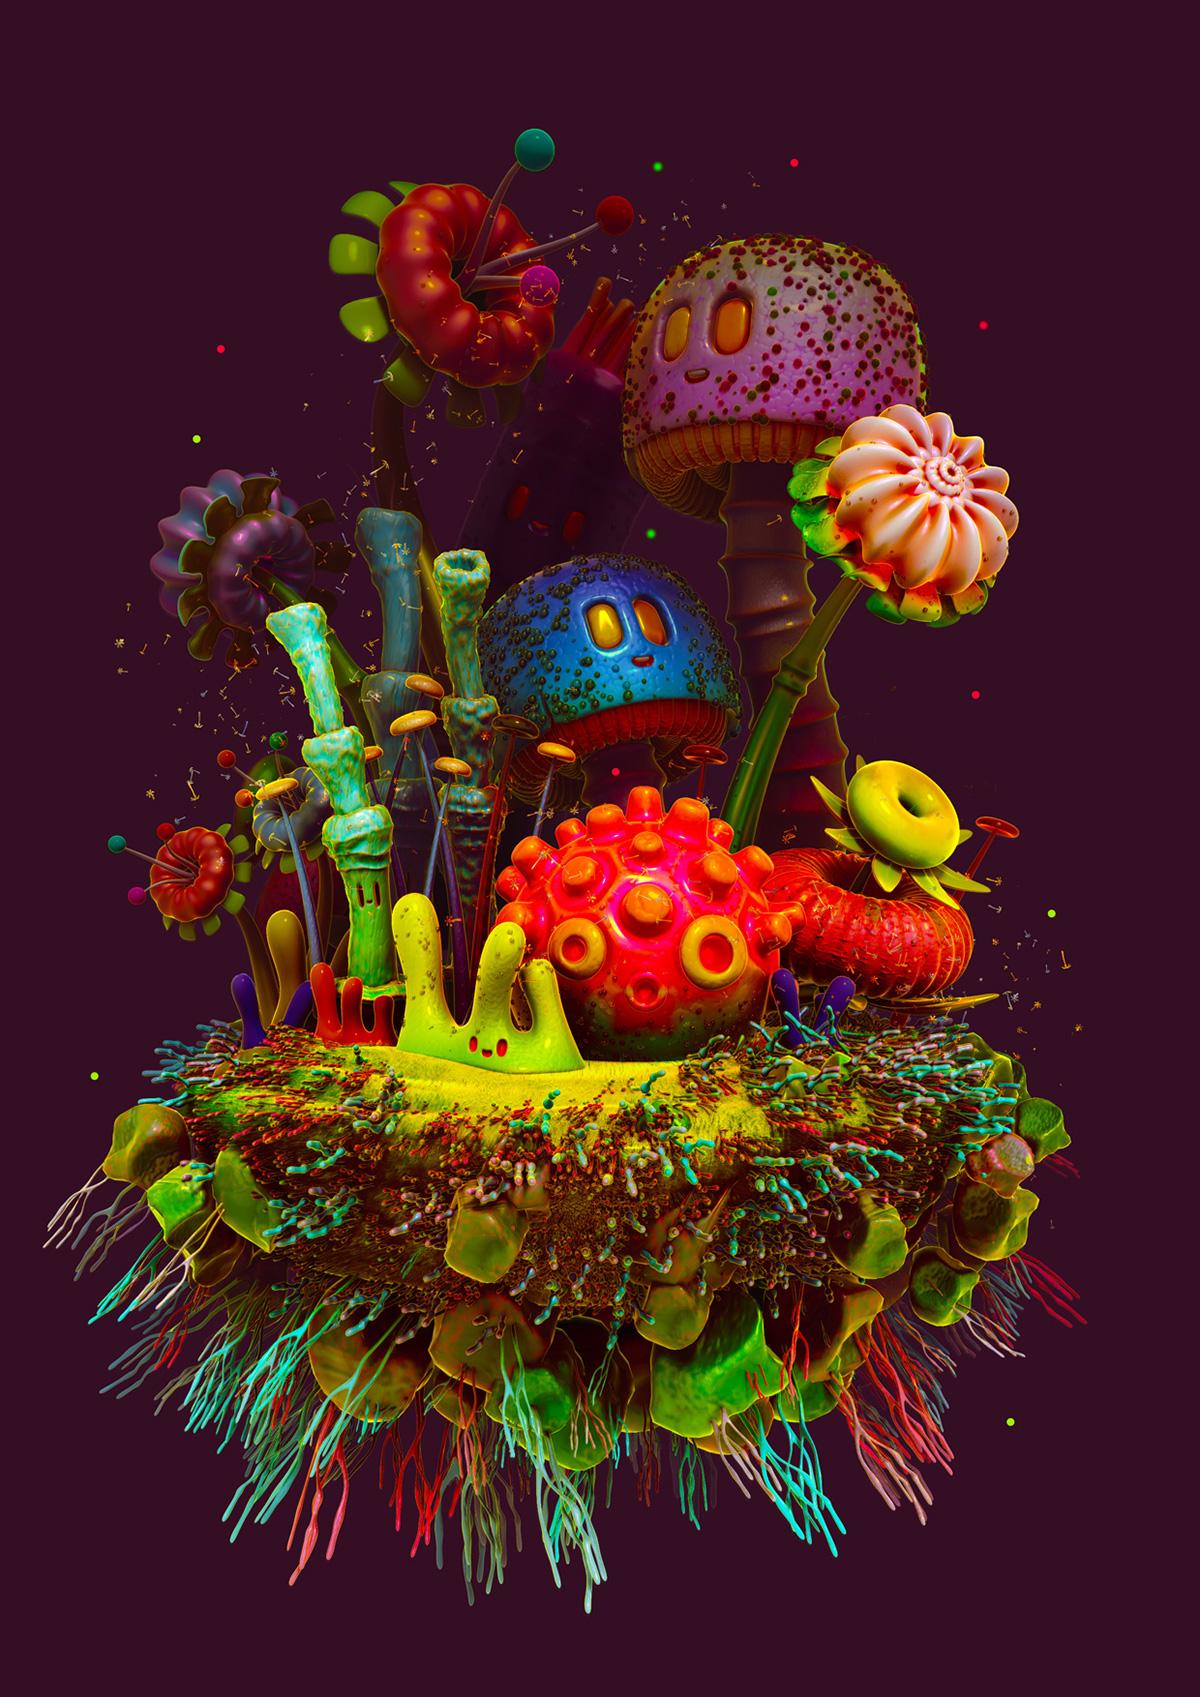 images?q=tbn:ANd9GcQh_l3eQ5xwiPy07kGEXjmjgmBKBRB7H2mRxCGhv1tFWg5c_mWT Trends For Vector Art 3d @koolgadgetz.com.info